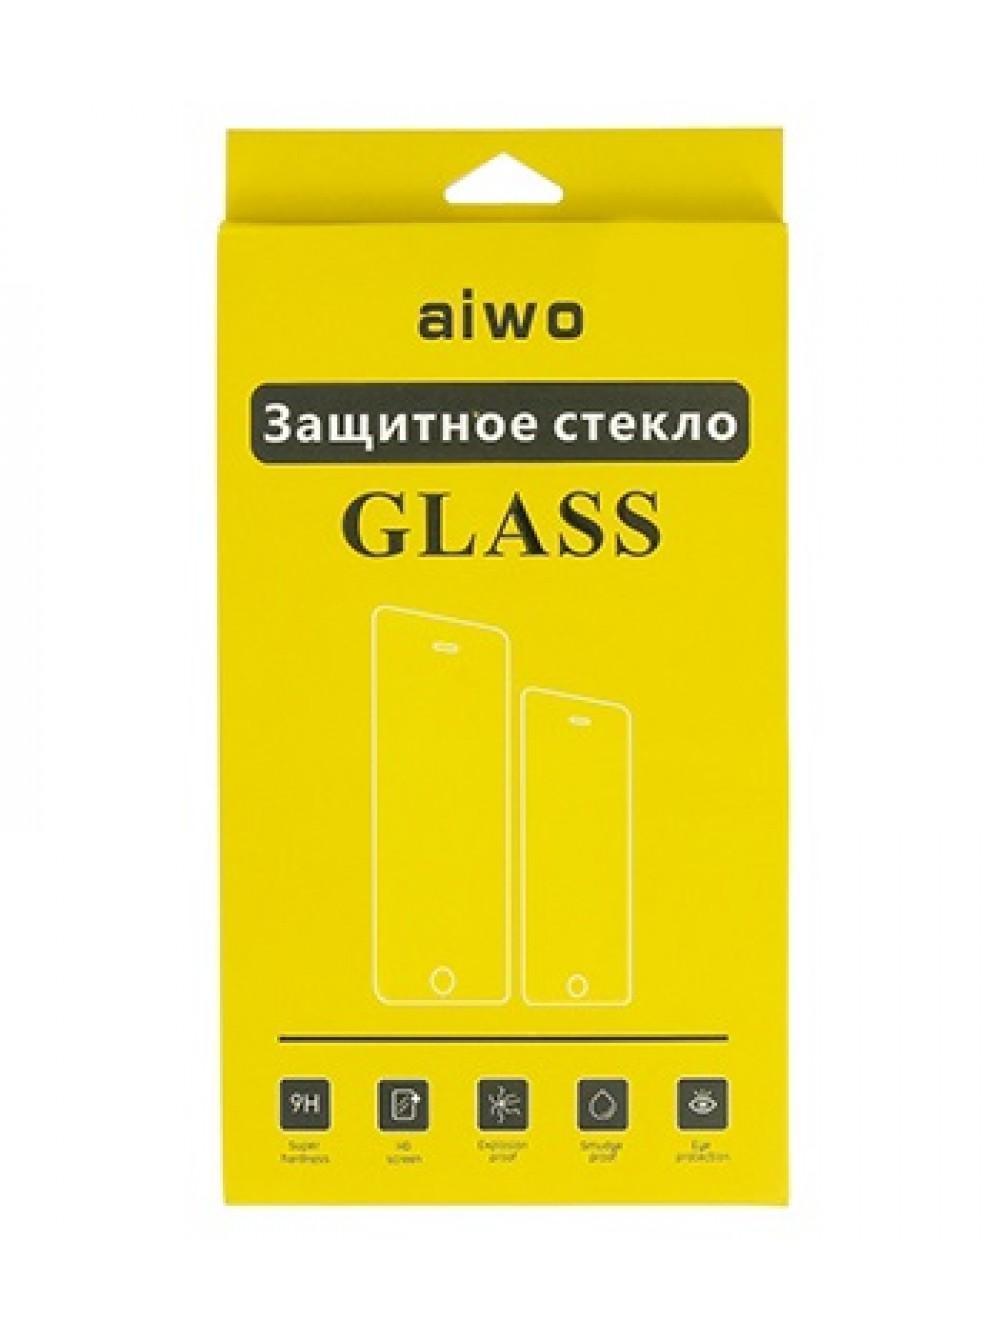 Защитное стекло AIWO 9H 0.33mm для Samsung Galaxy A5 (2016) SM-A510 (прозрачное антибликовое) фото